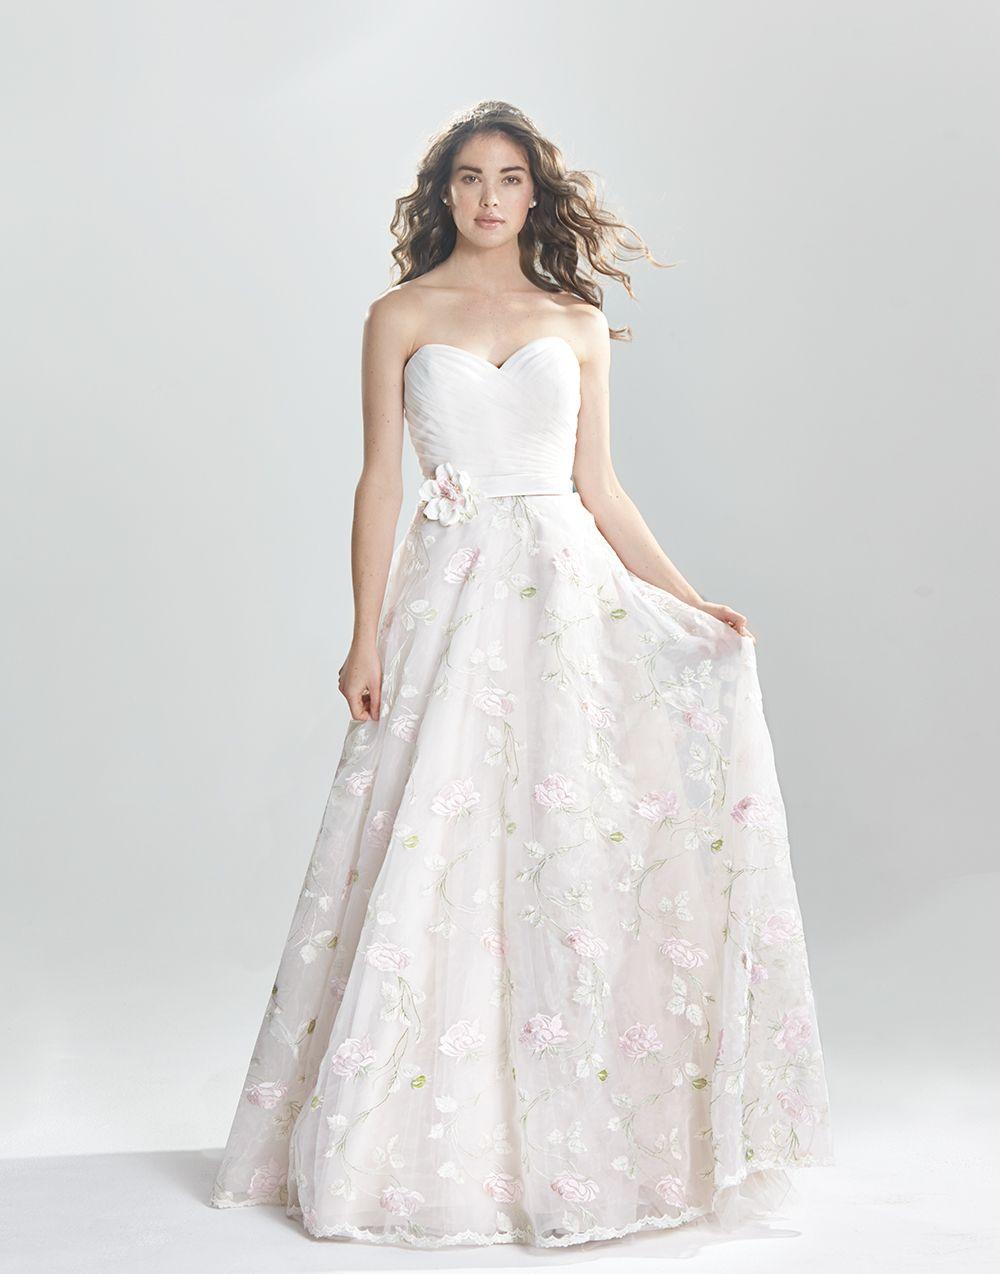 Lillian west wedding dress  Lillian West lillian west style  Sweetheart ruched bodice